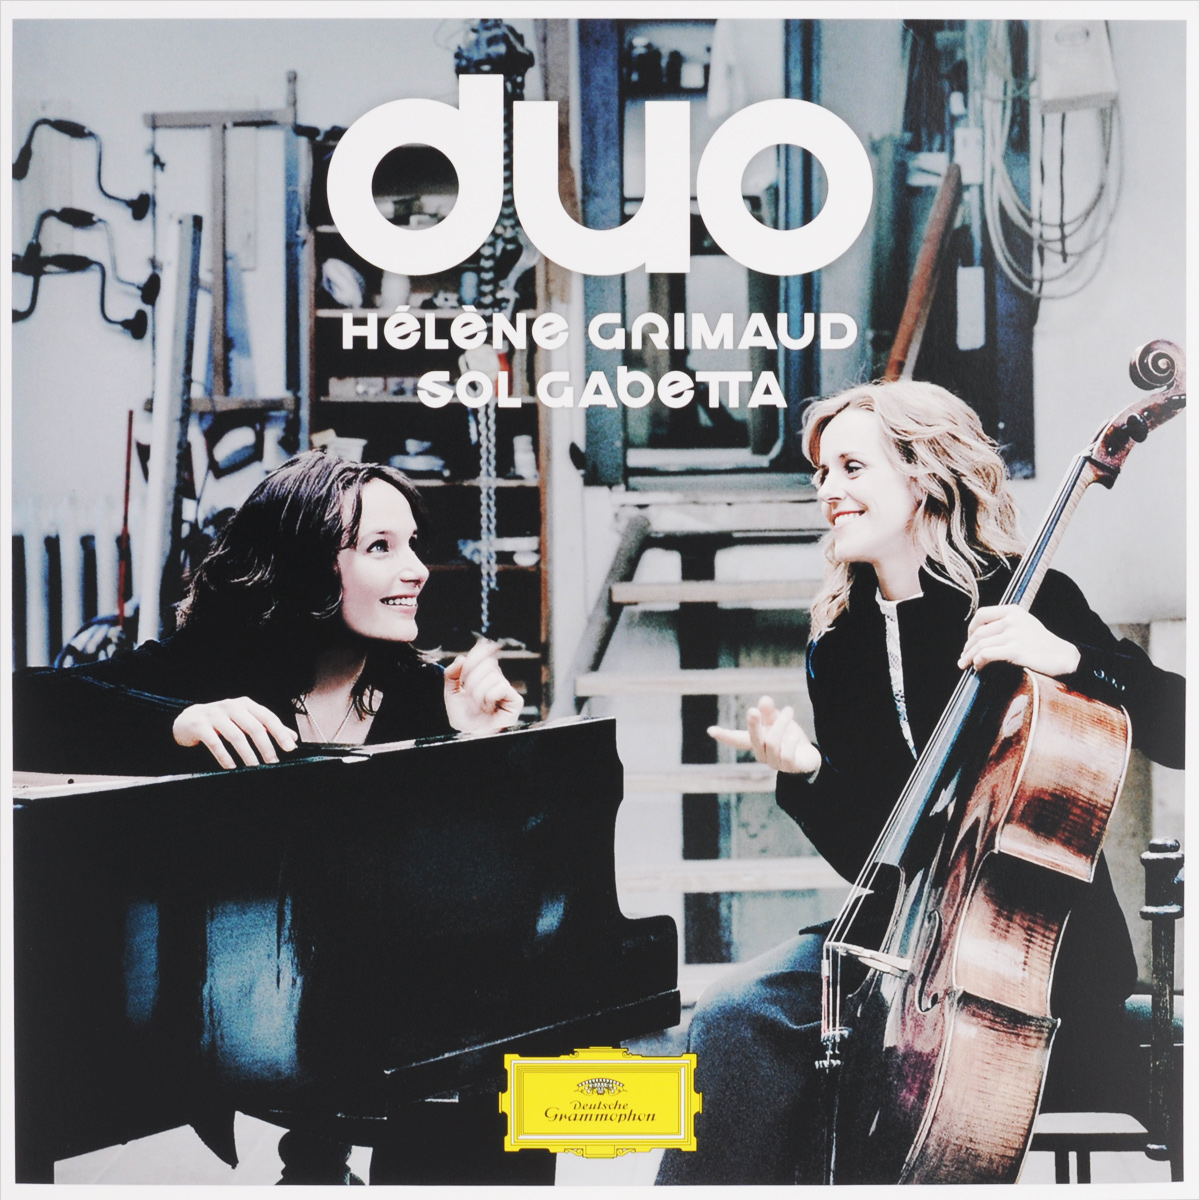 Элен Гримо,Сол Габетта Helene Grimaud / Sol Gabetta. Duo (2 LP) наушники накладные sol republic tracks hd tokidoki 1298 02